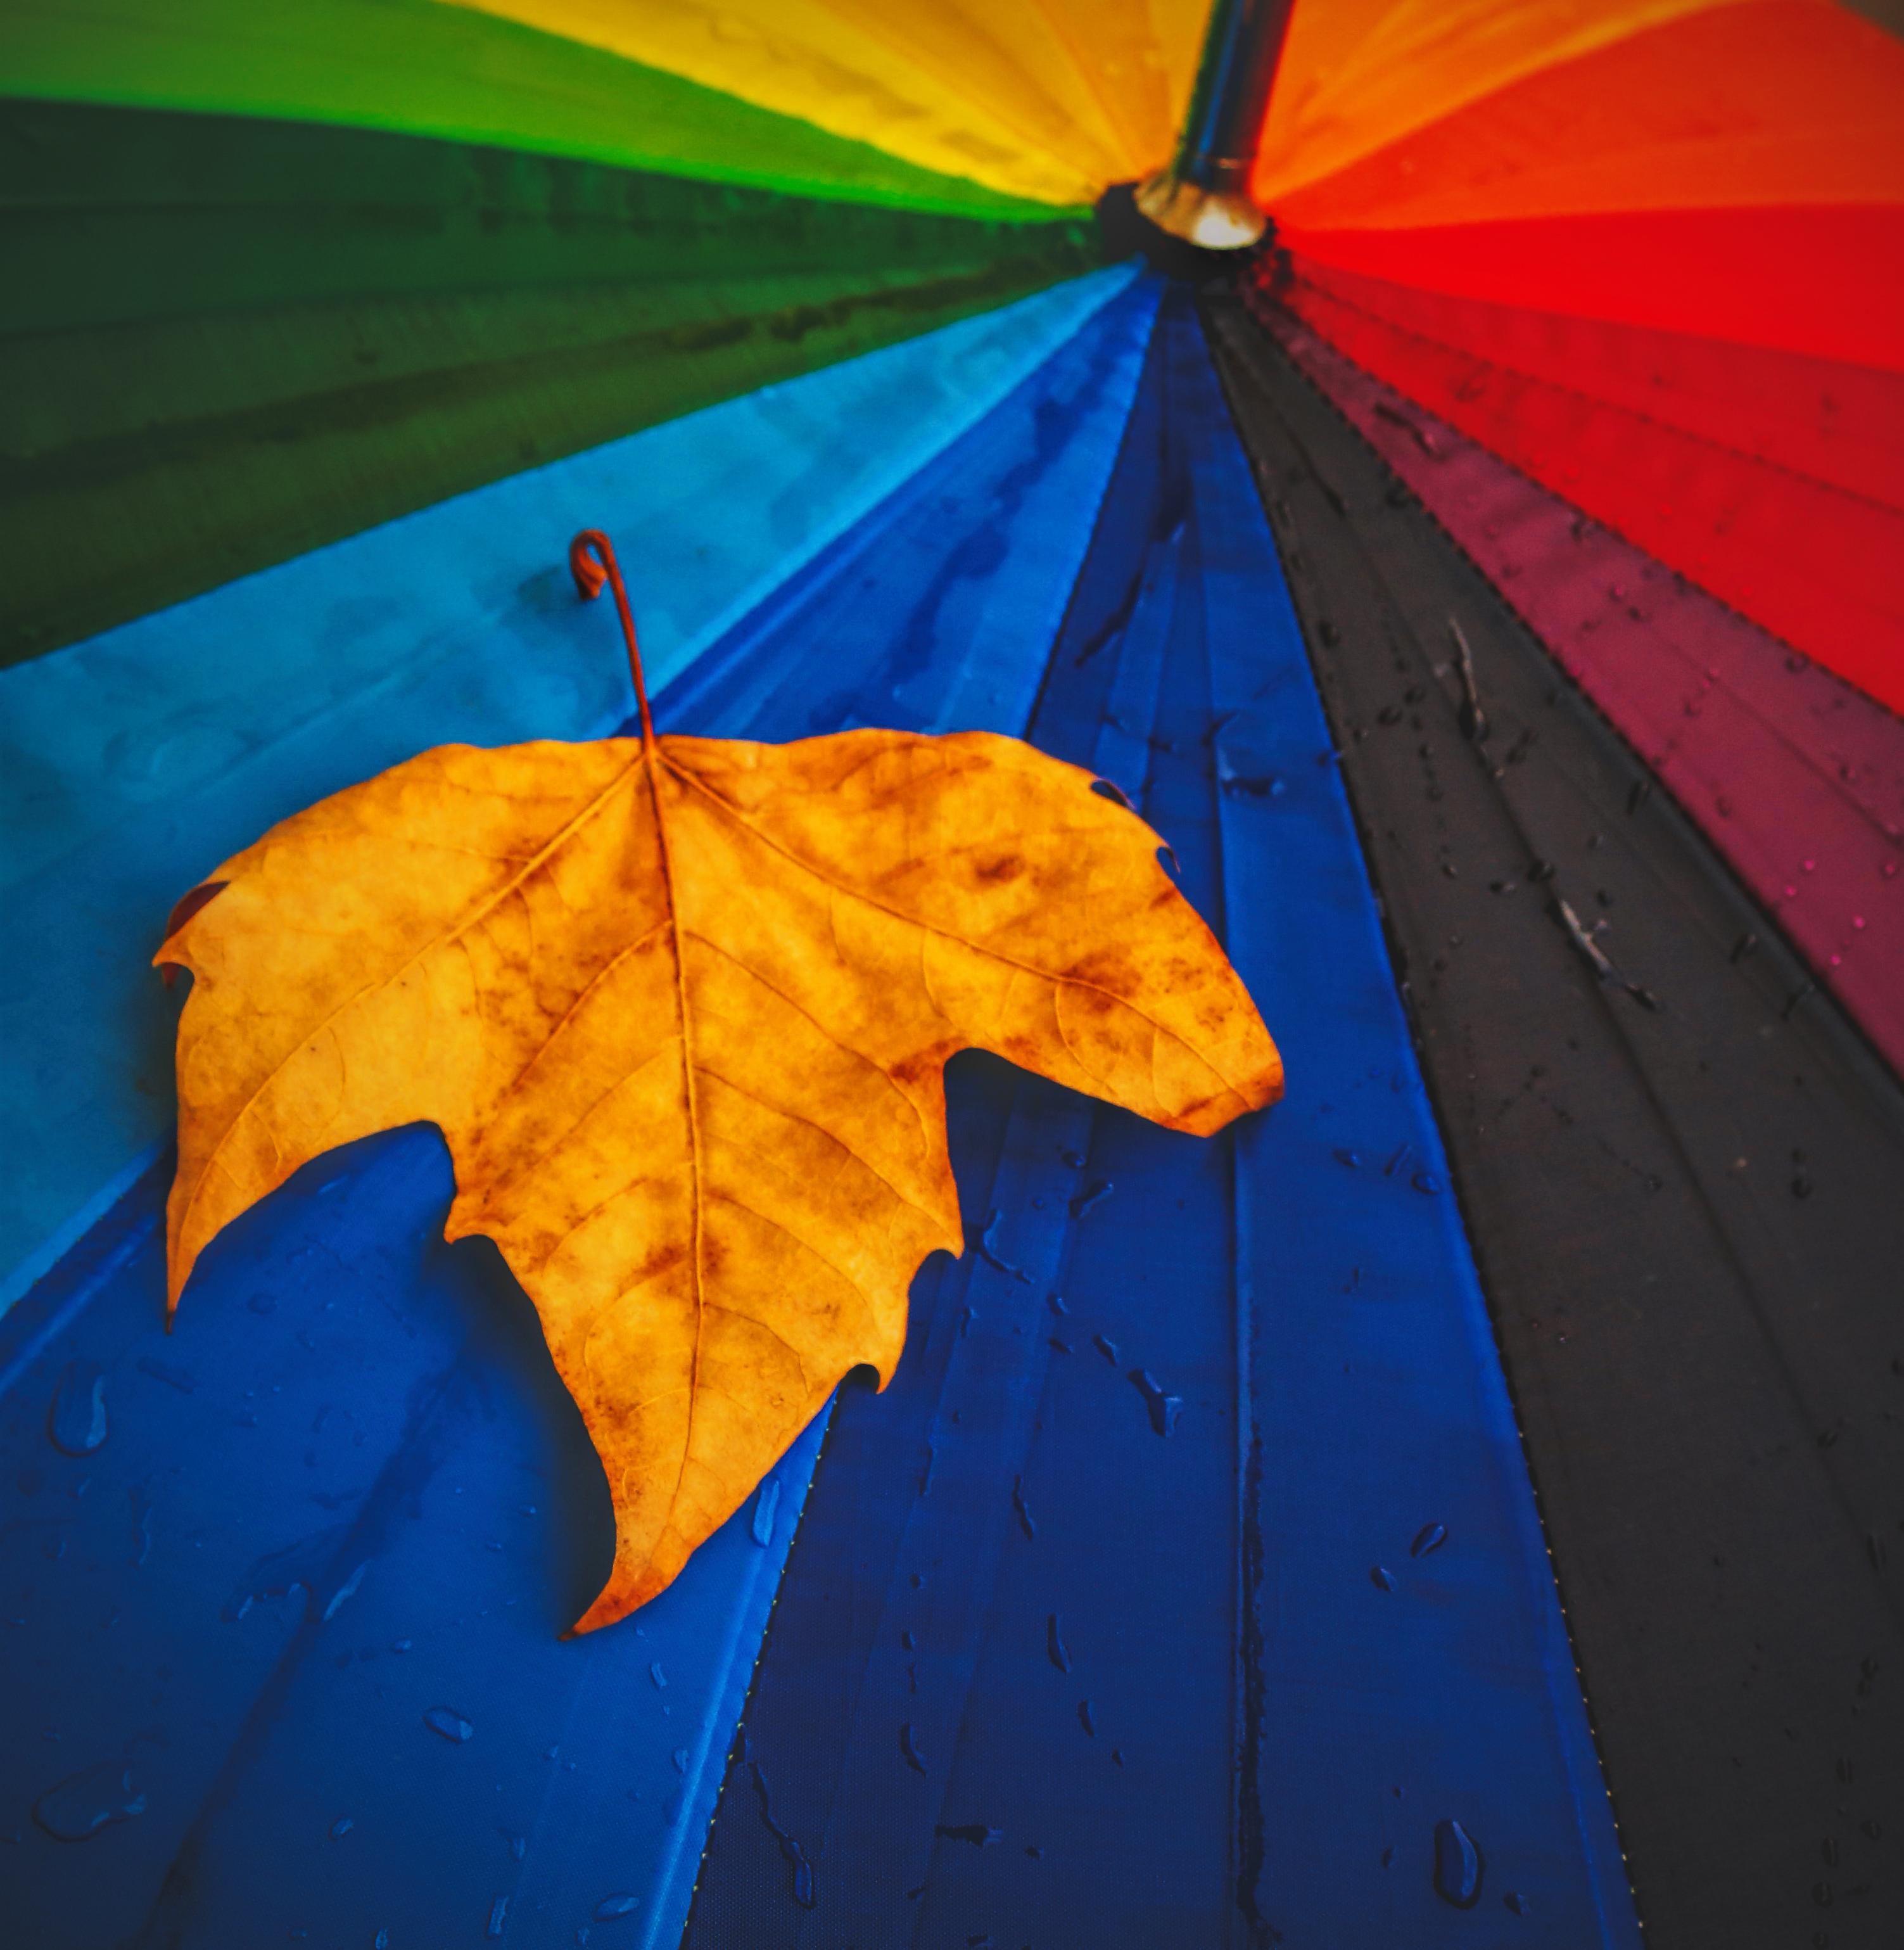 autumn rain leaf yellow maple leaf umbrella sky tree computer wallpaper plant 1453485